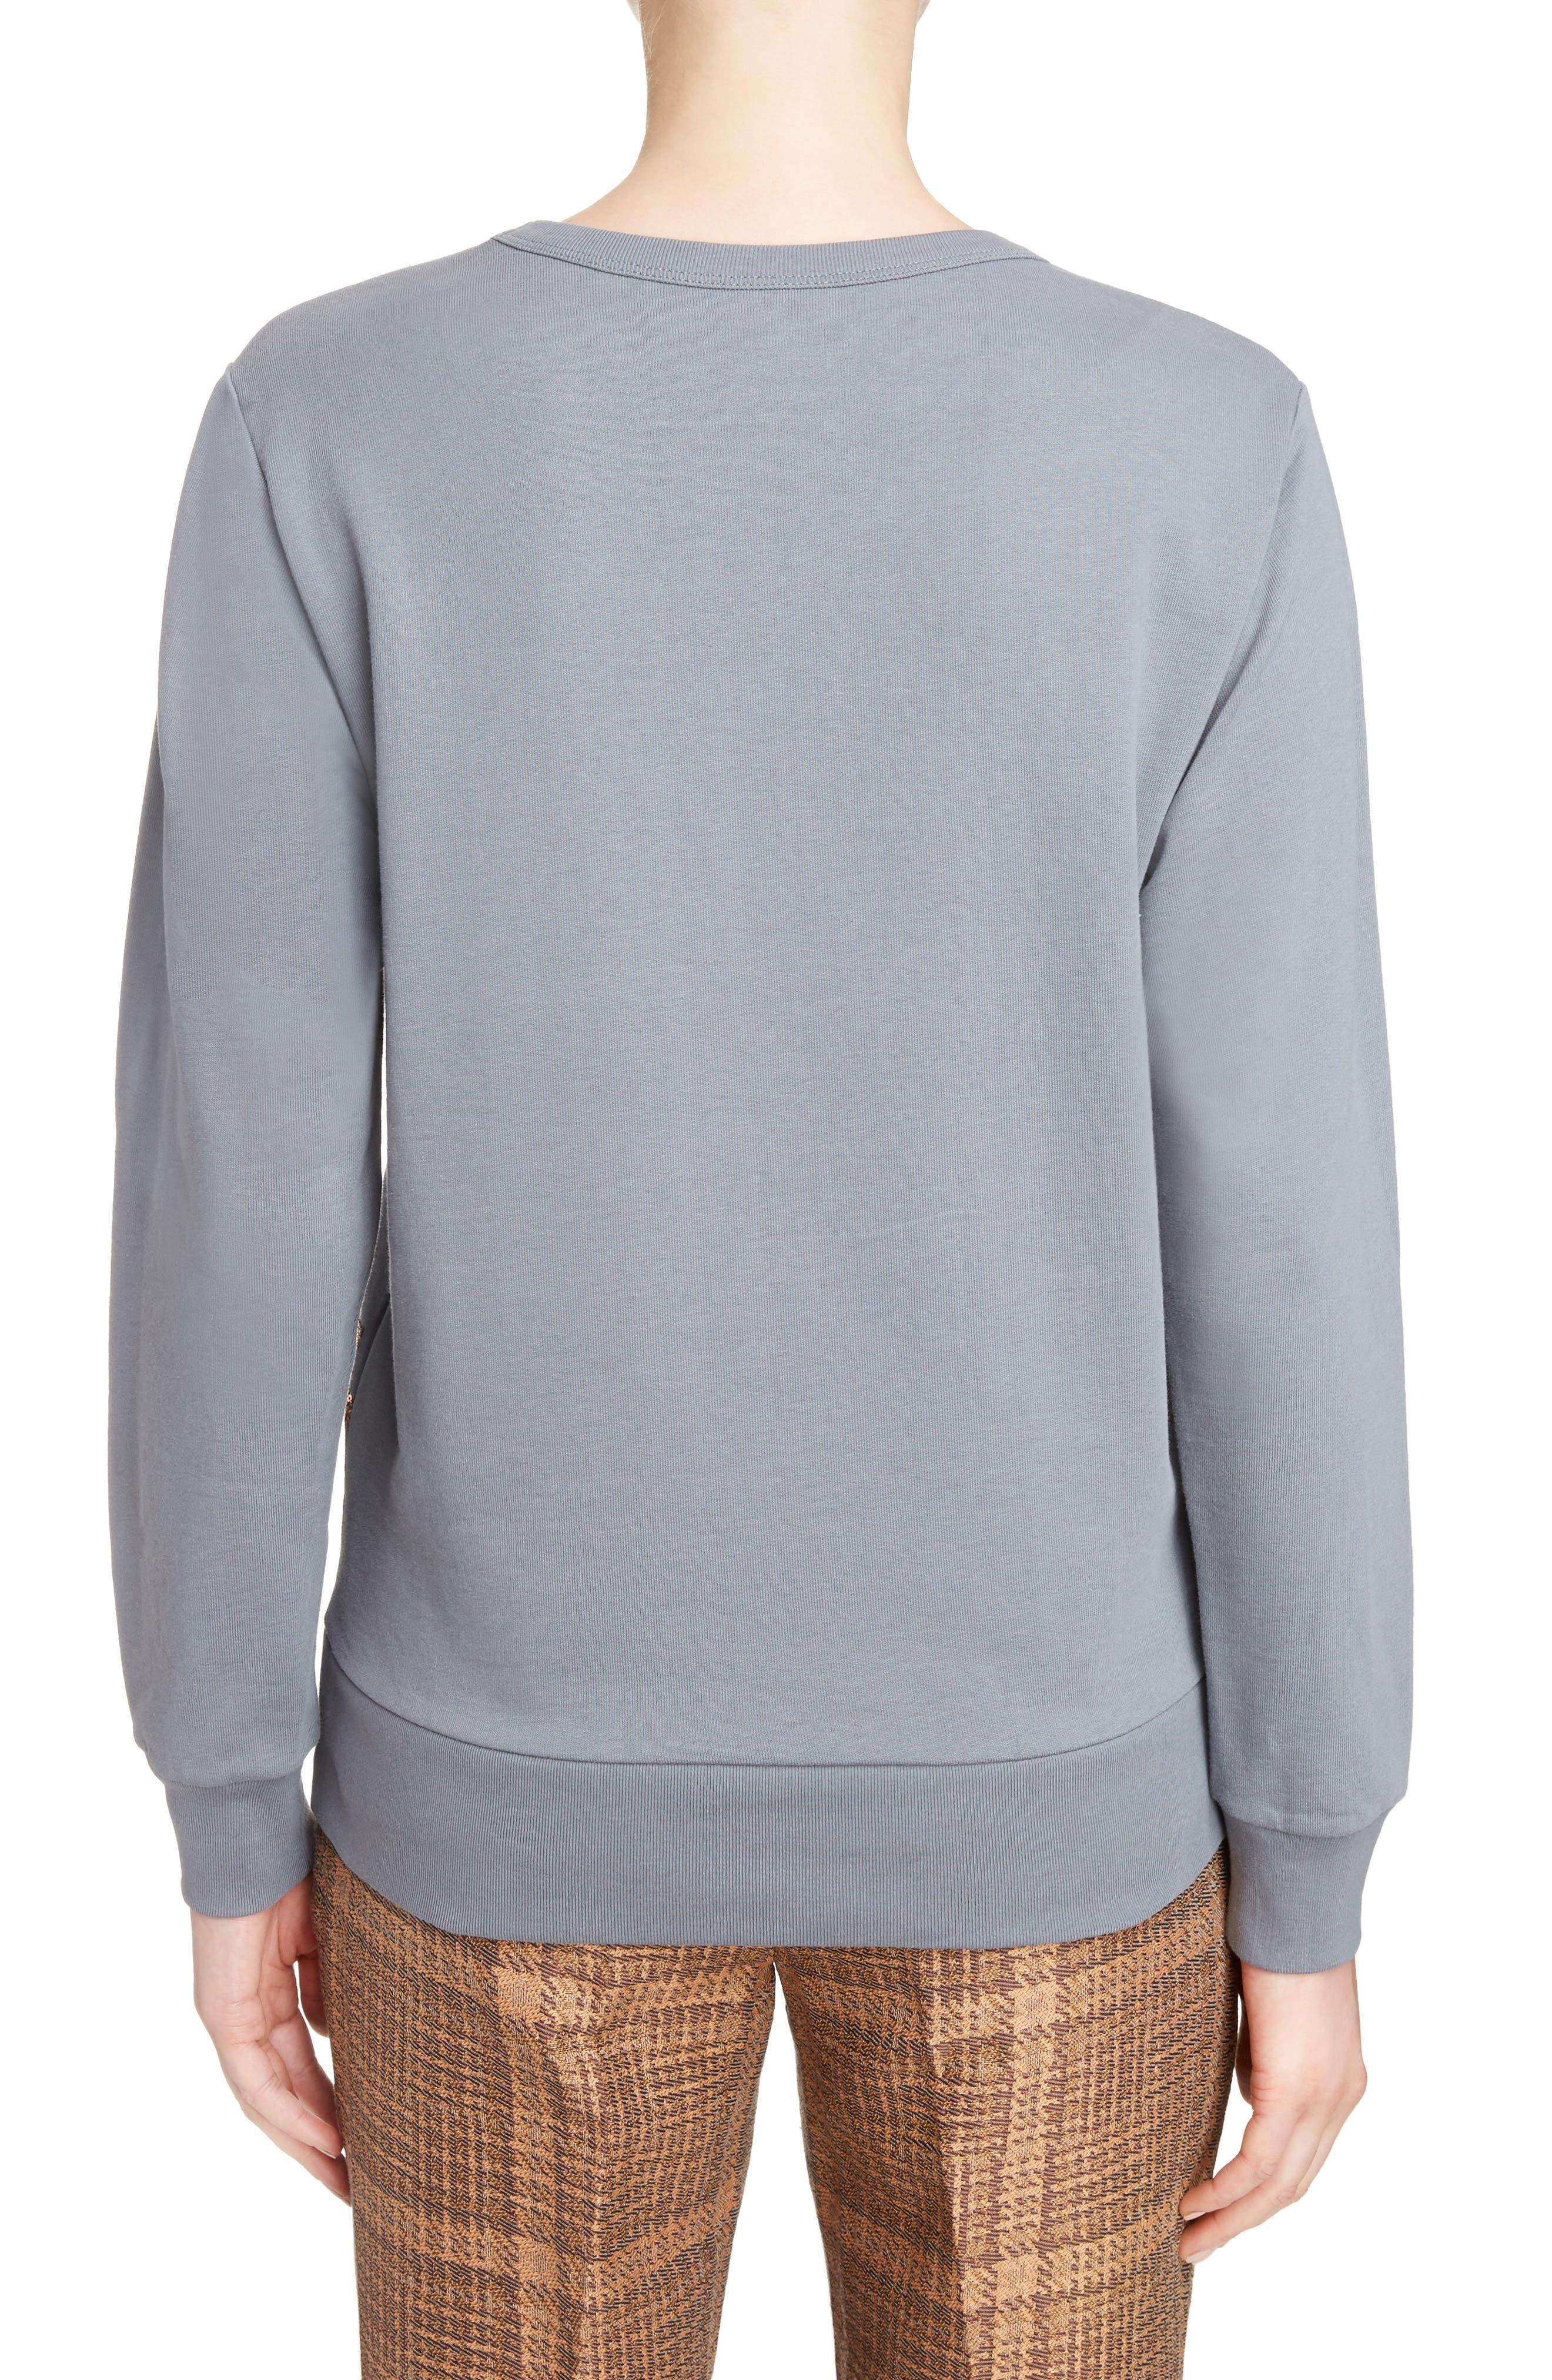 Sequin Embellished Sweatshirt,                             Alternate thumbnail 2, color,                             Grey